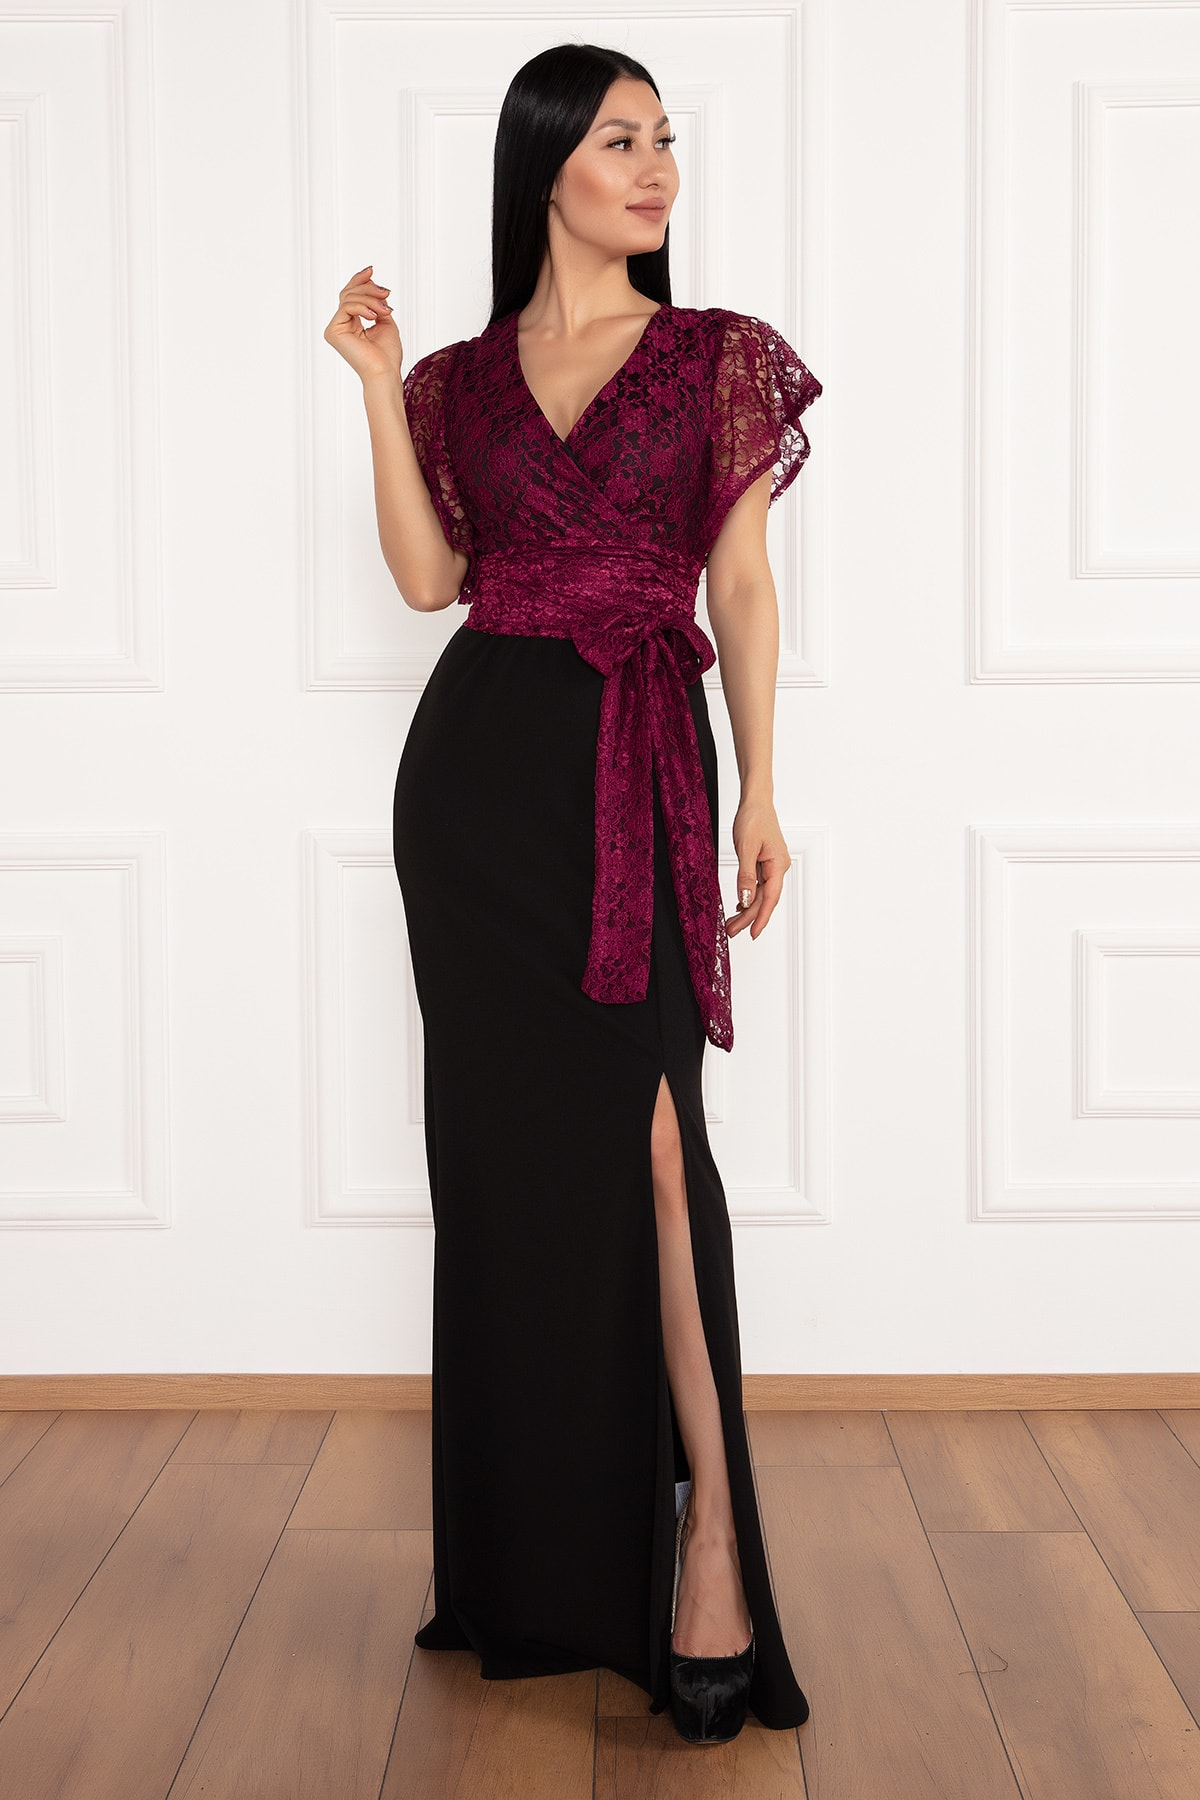 PULLIMM Olive Krep Üstü Dantel Uzun Elbise 13214 1